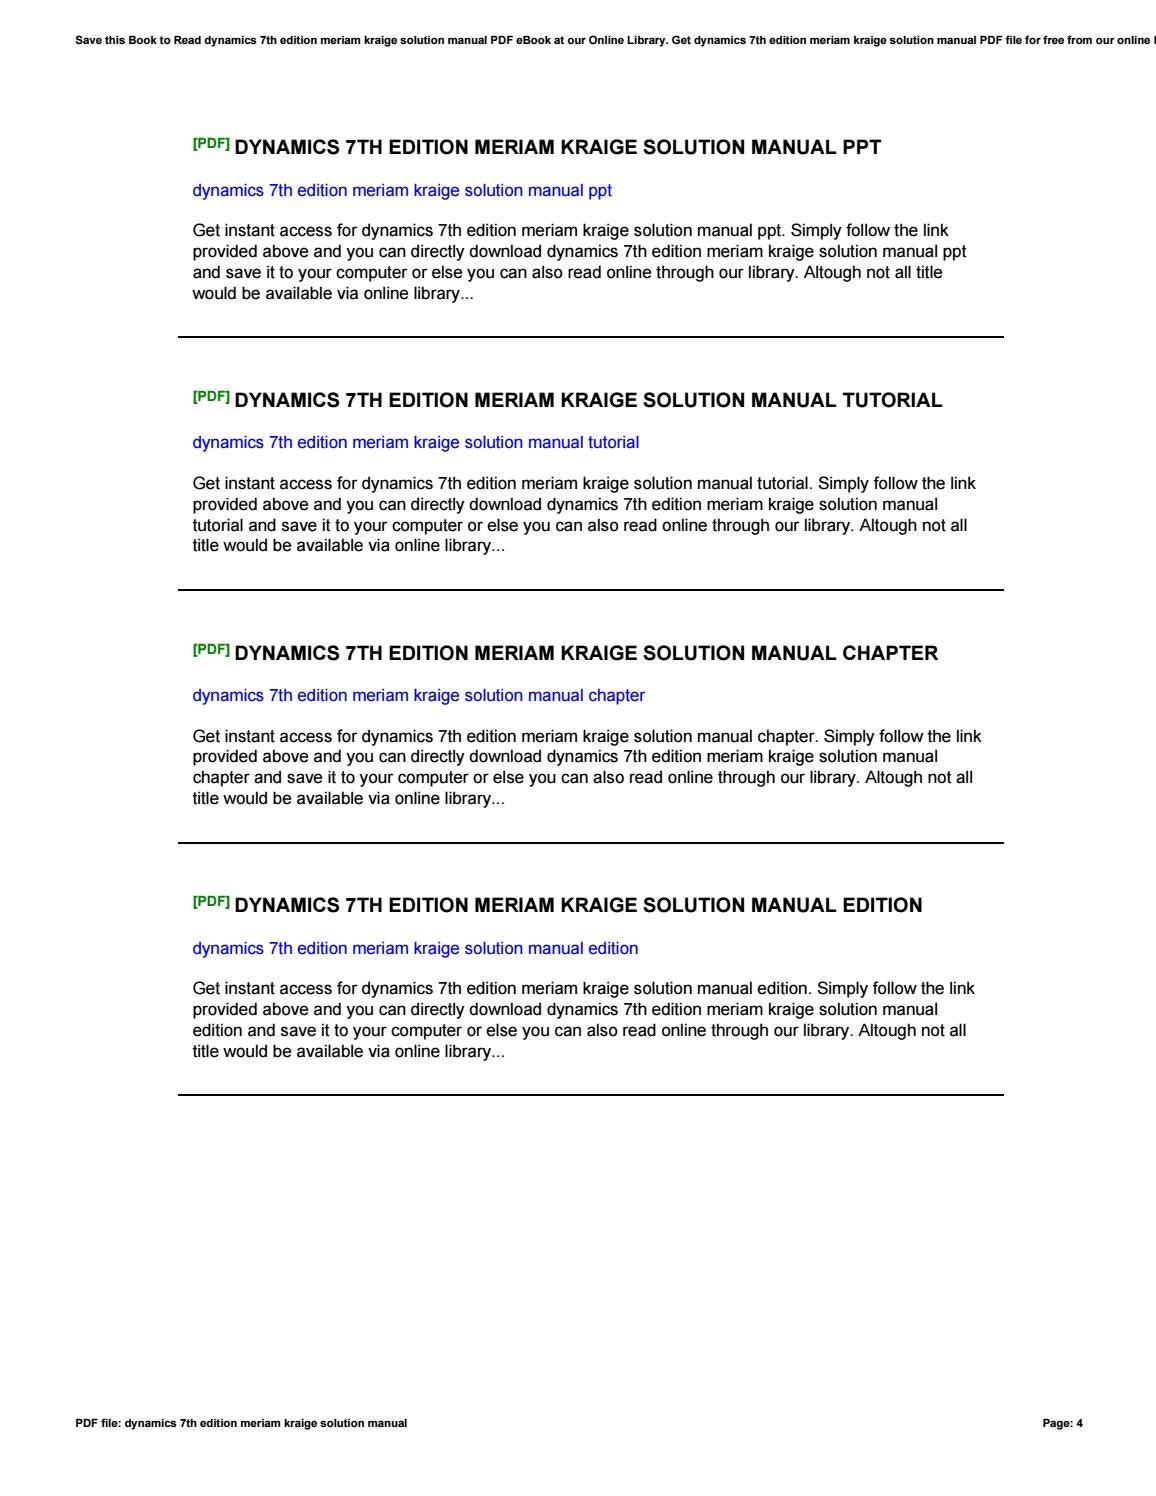 dynamics meriam 8th edition solution manual